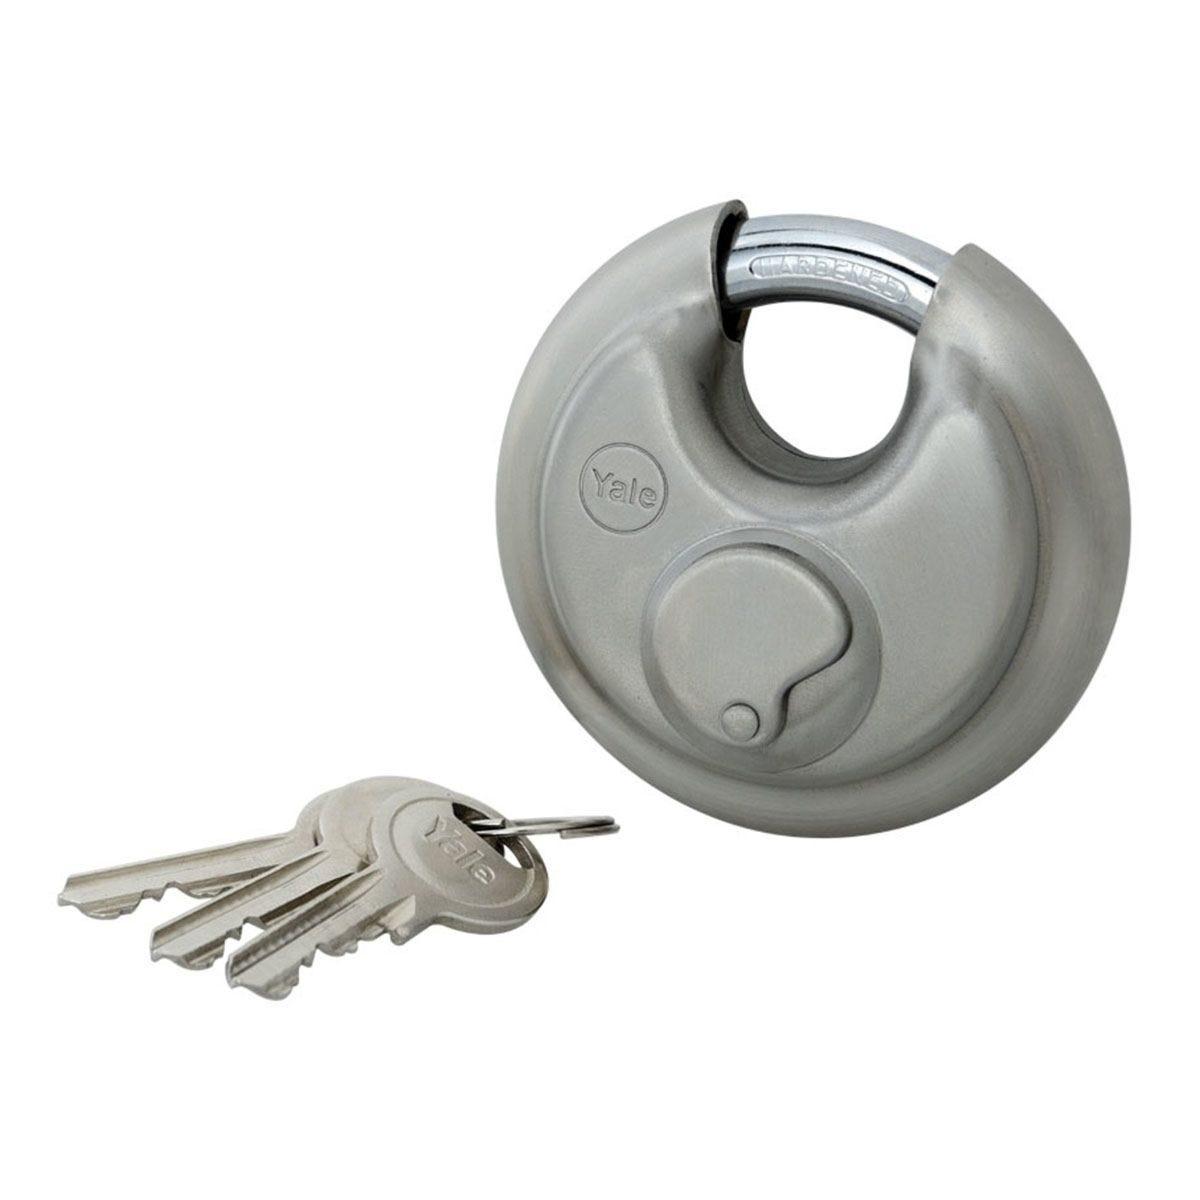 Yale High Security Disc Padlock